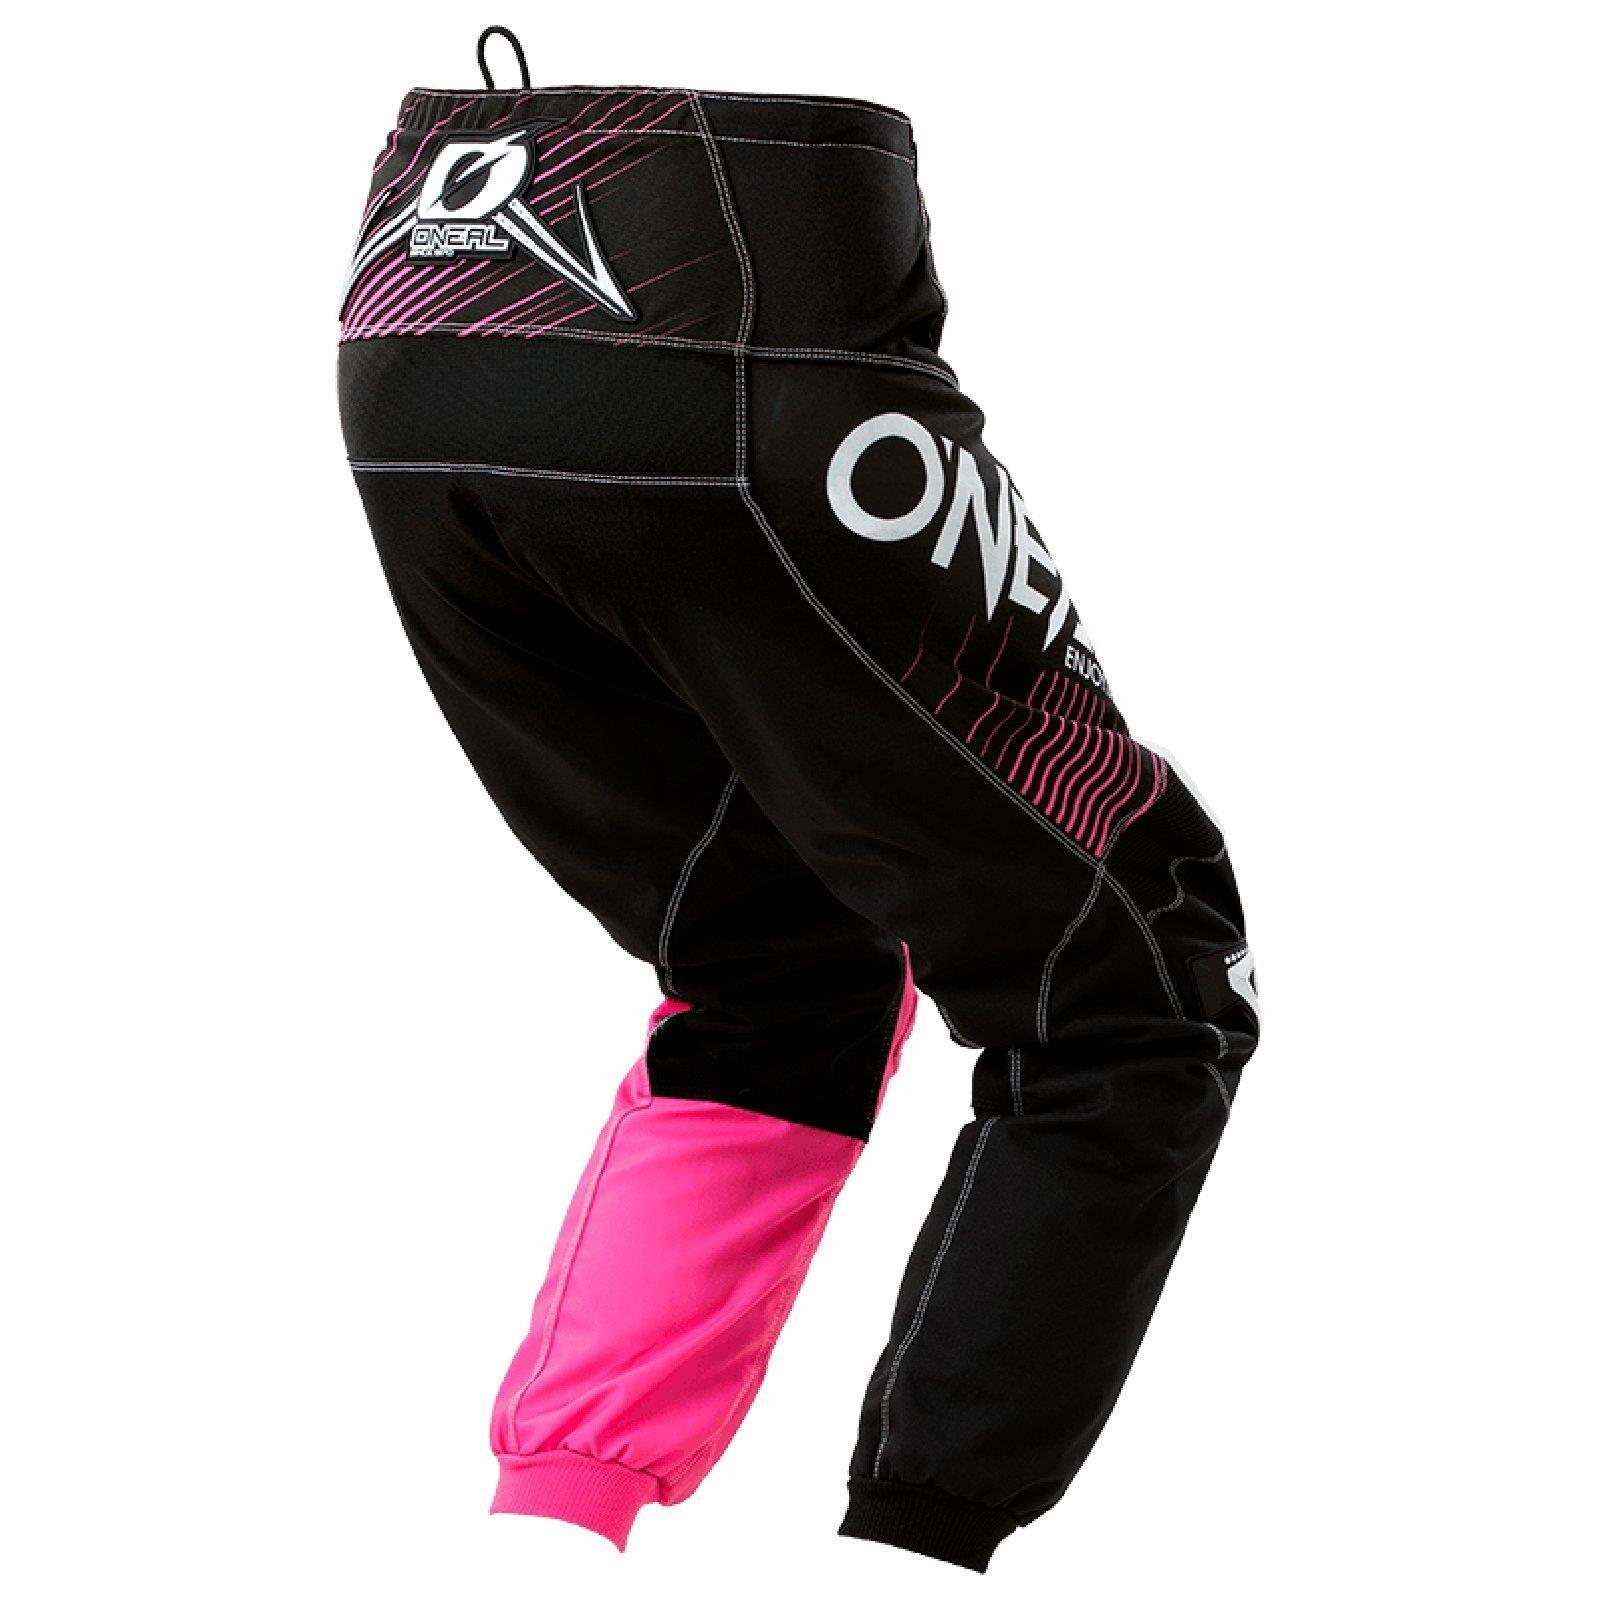 ONEAL-DONNA-MOTO-CROSS-MTB-SHIRT-ragazze-Jersey-Pantaloni-Rosa-Casco-bicicletta-DH-ENDURO miniatura 20